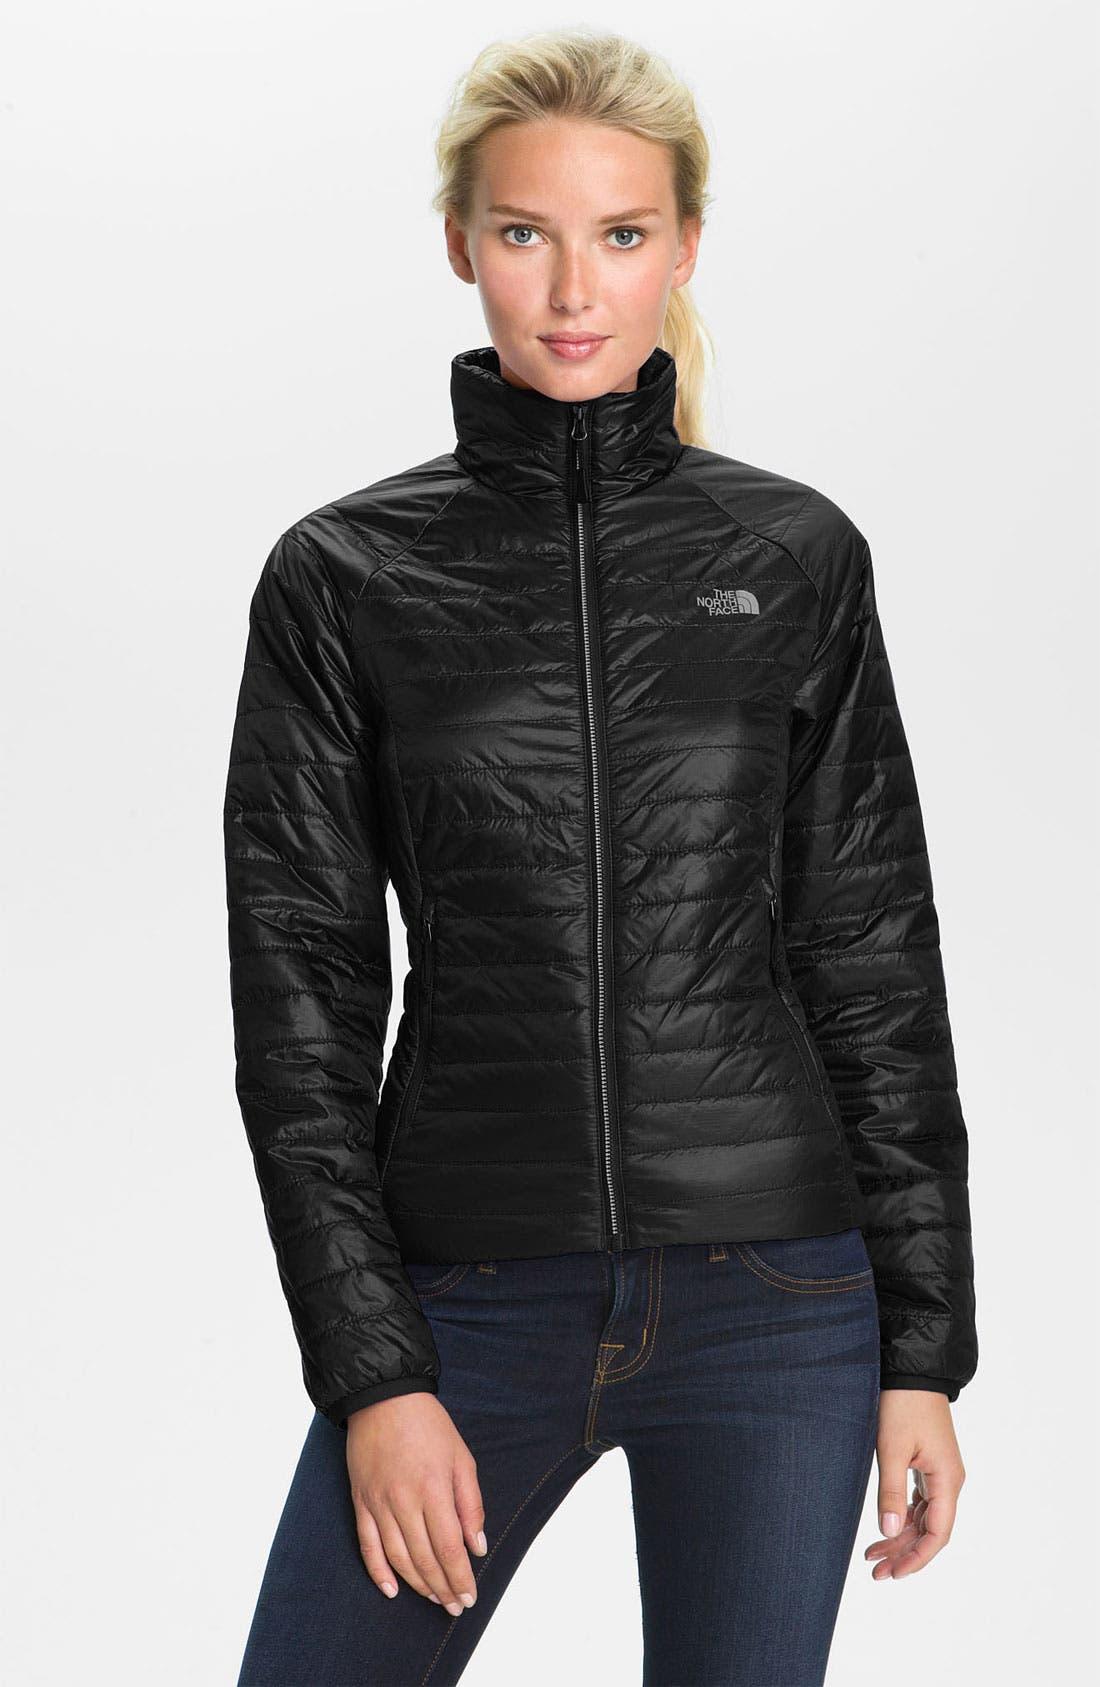 Main Image - The North Face 'Blaze' Jacket